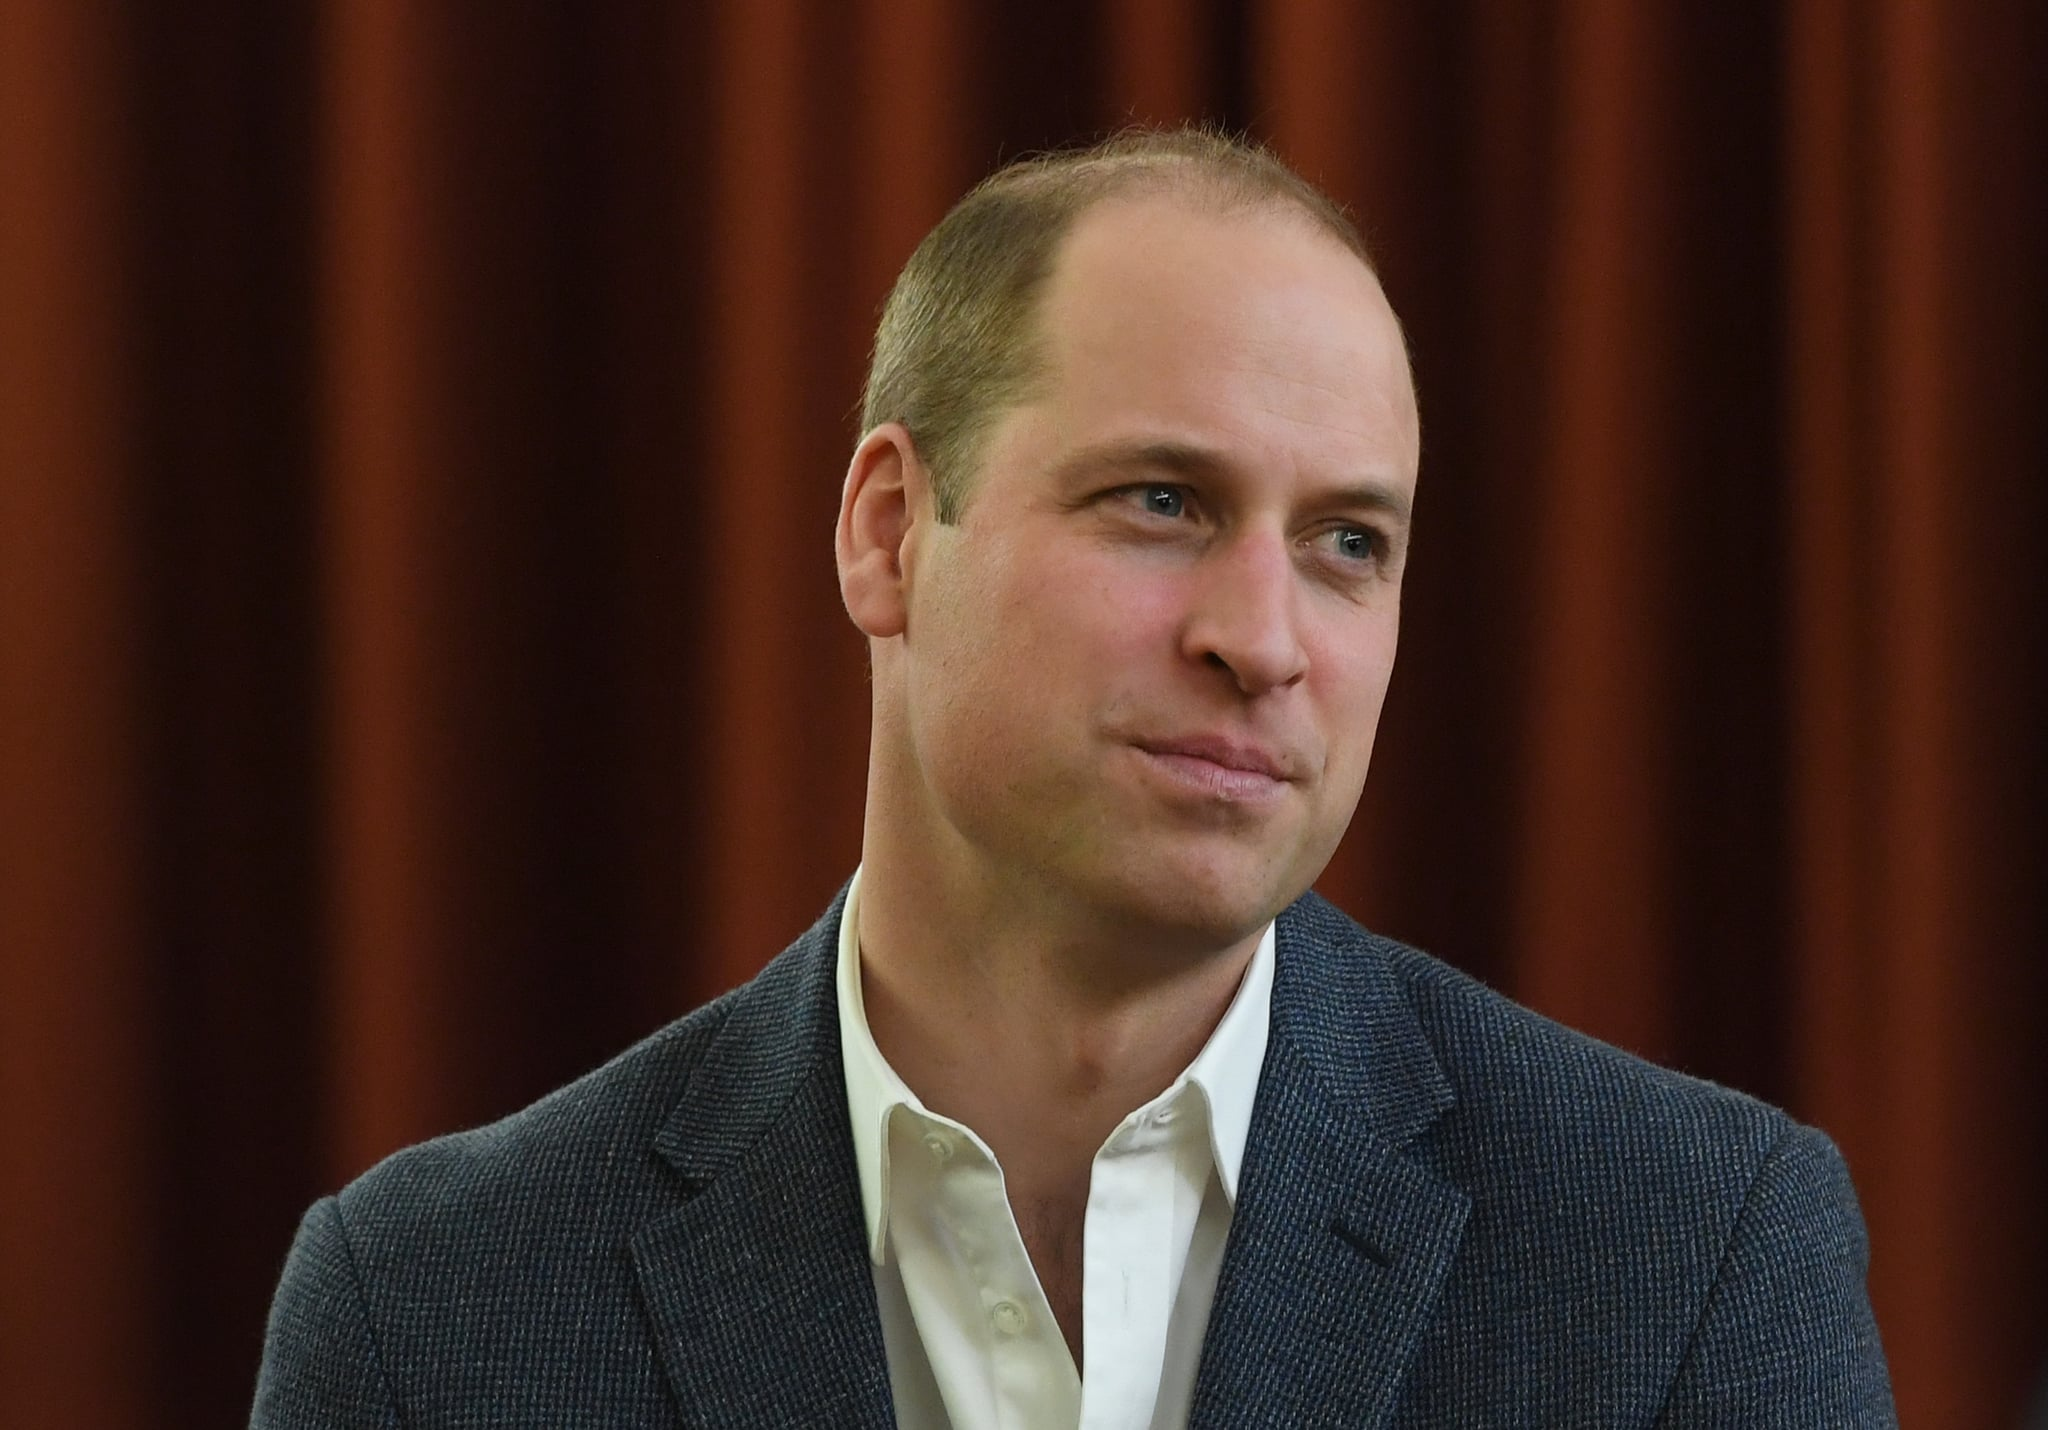 Prince William New Zealand Visit Details 2019